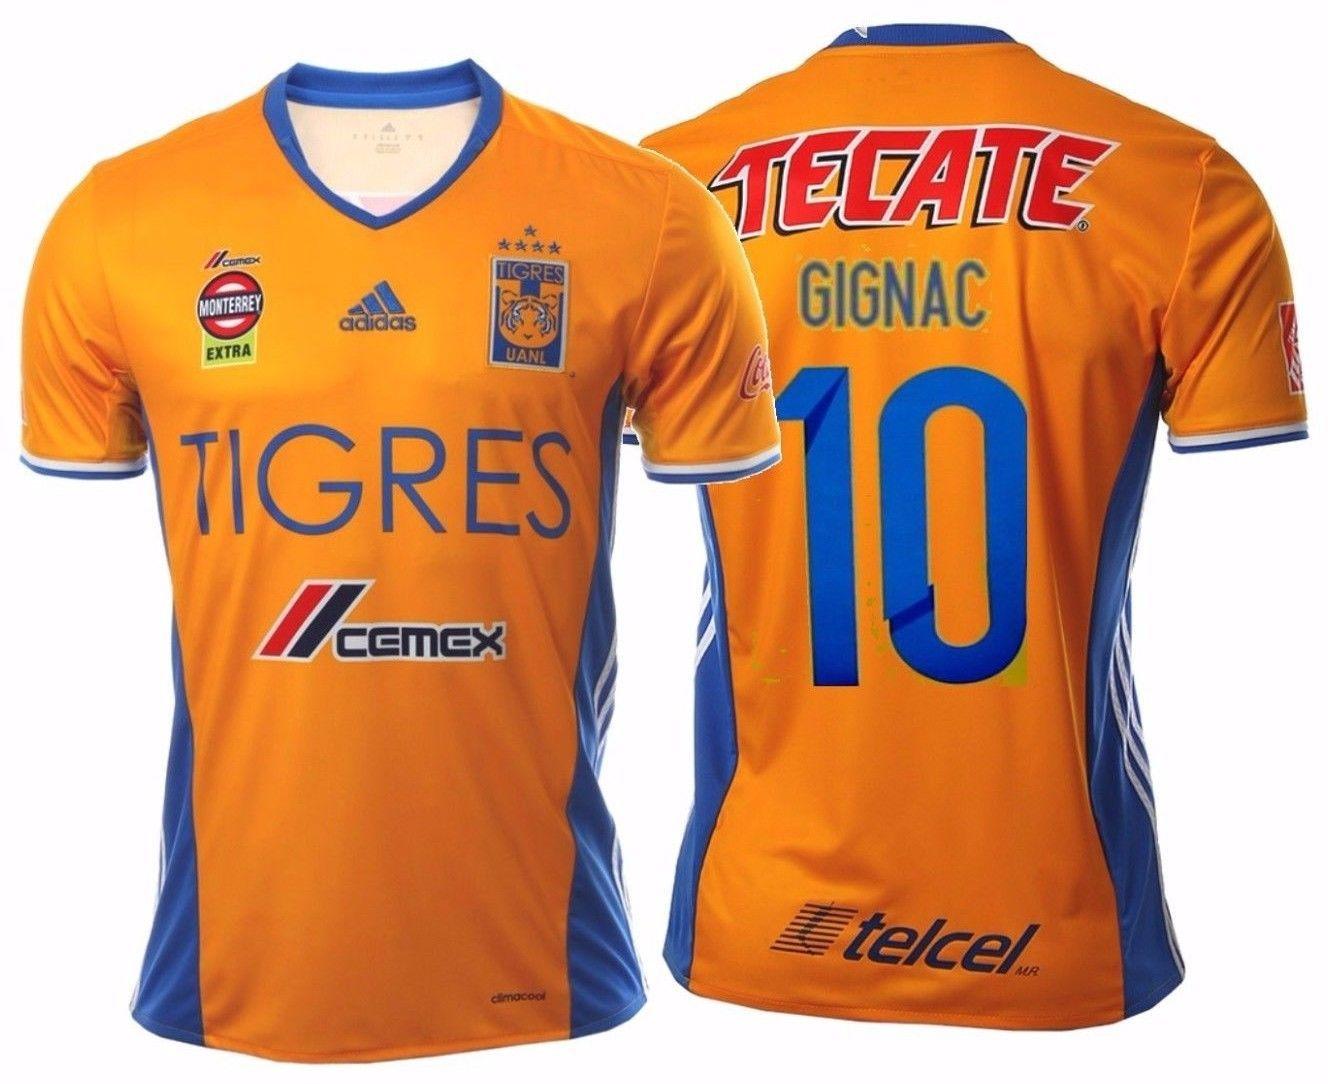 29deda385d4 Adidas Andre Pierre Gignac Tigres Uanl 5 and 50 similar items